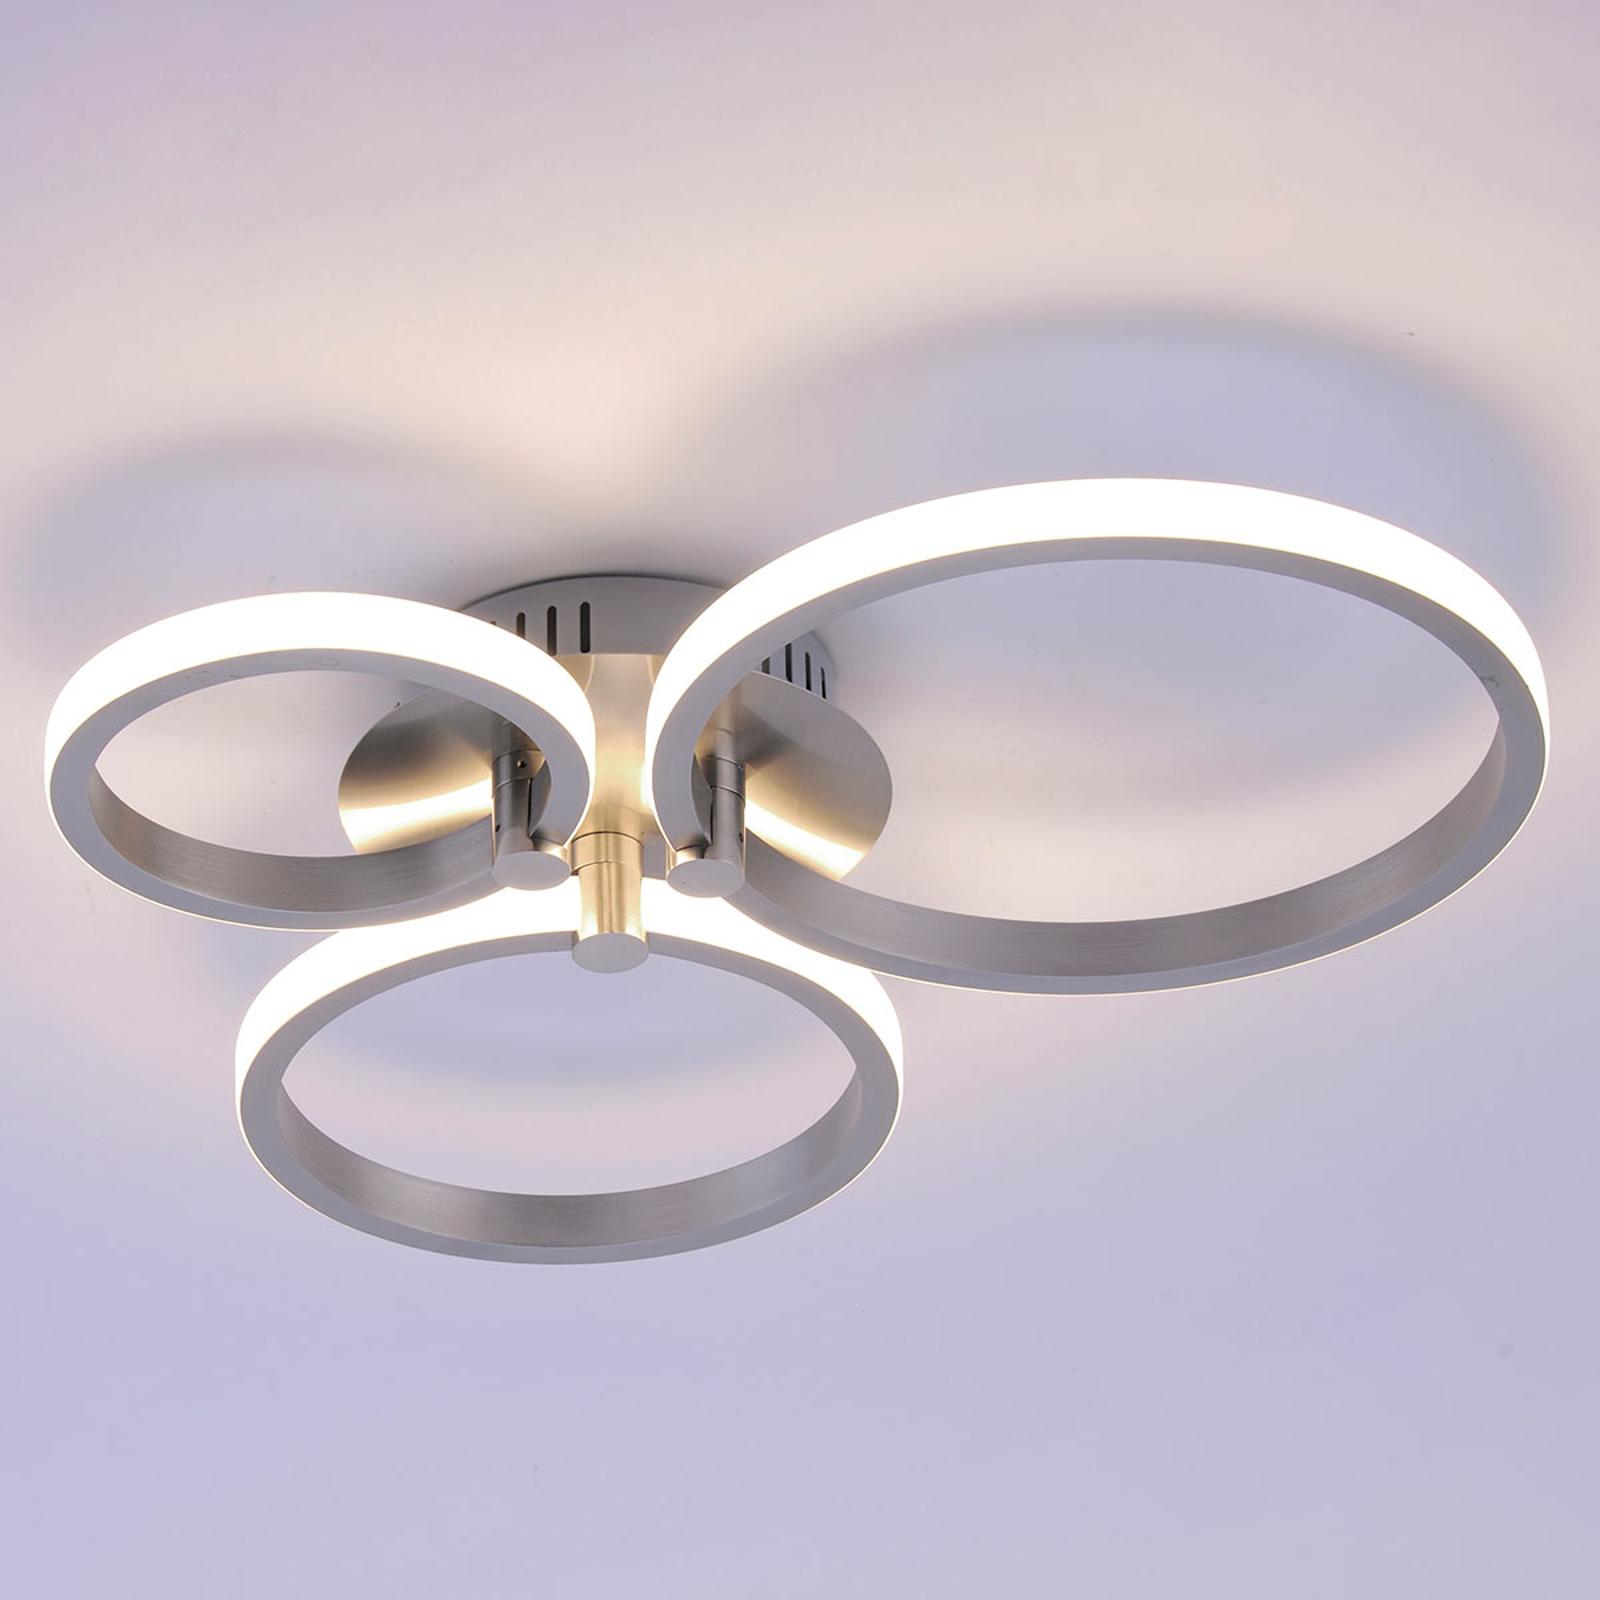 LED-taklampe Johanna 3 lys